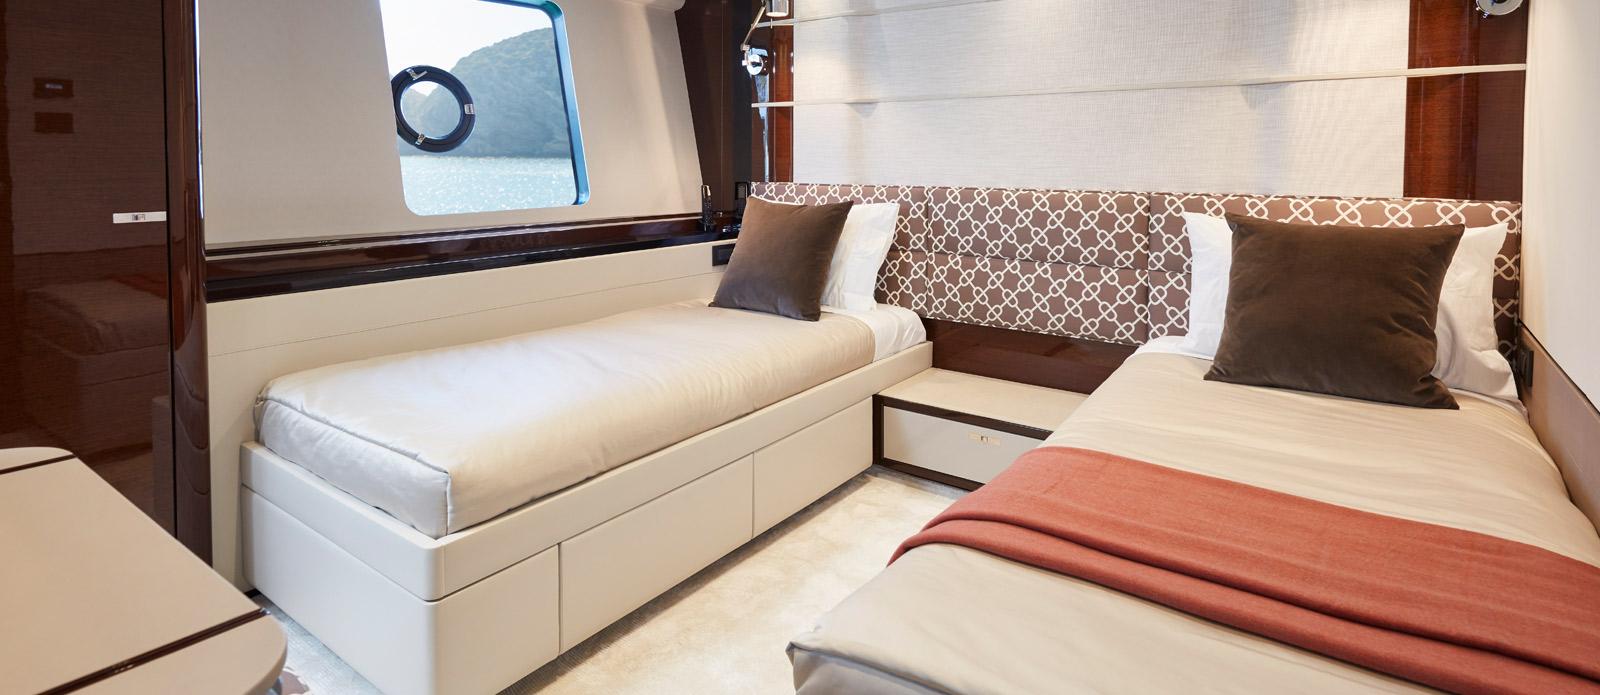 Princess 30 Metre Yacht Bandazul - Twin Guest Cabin